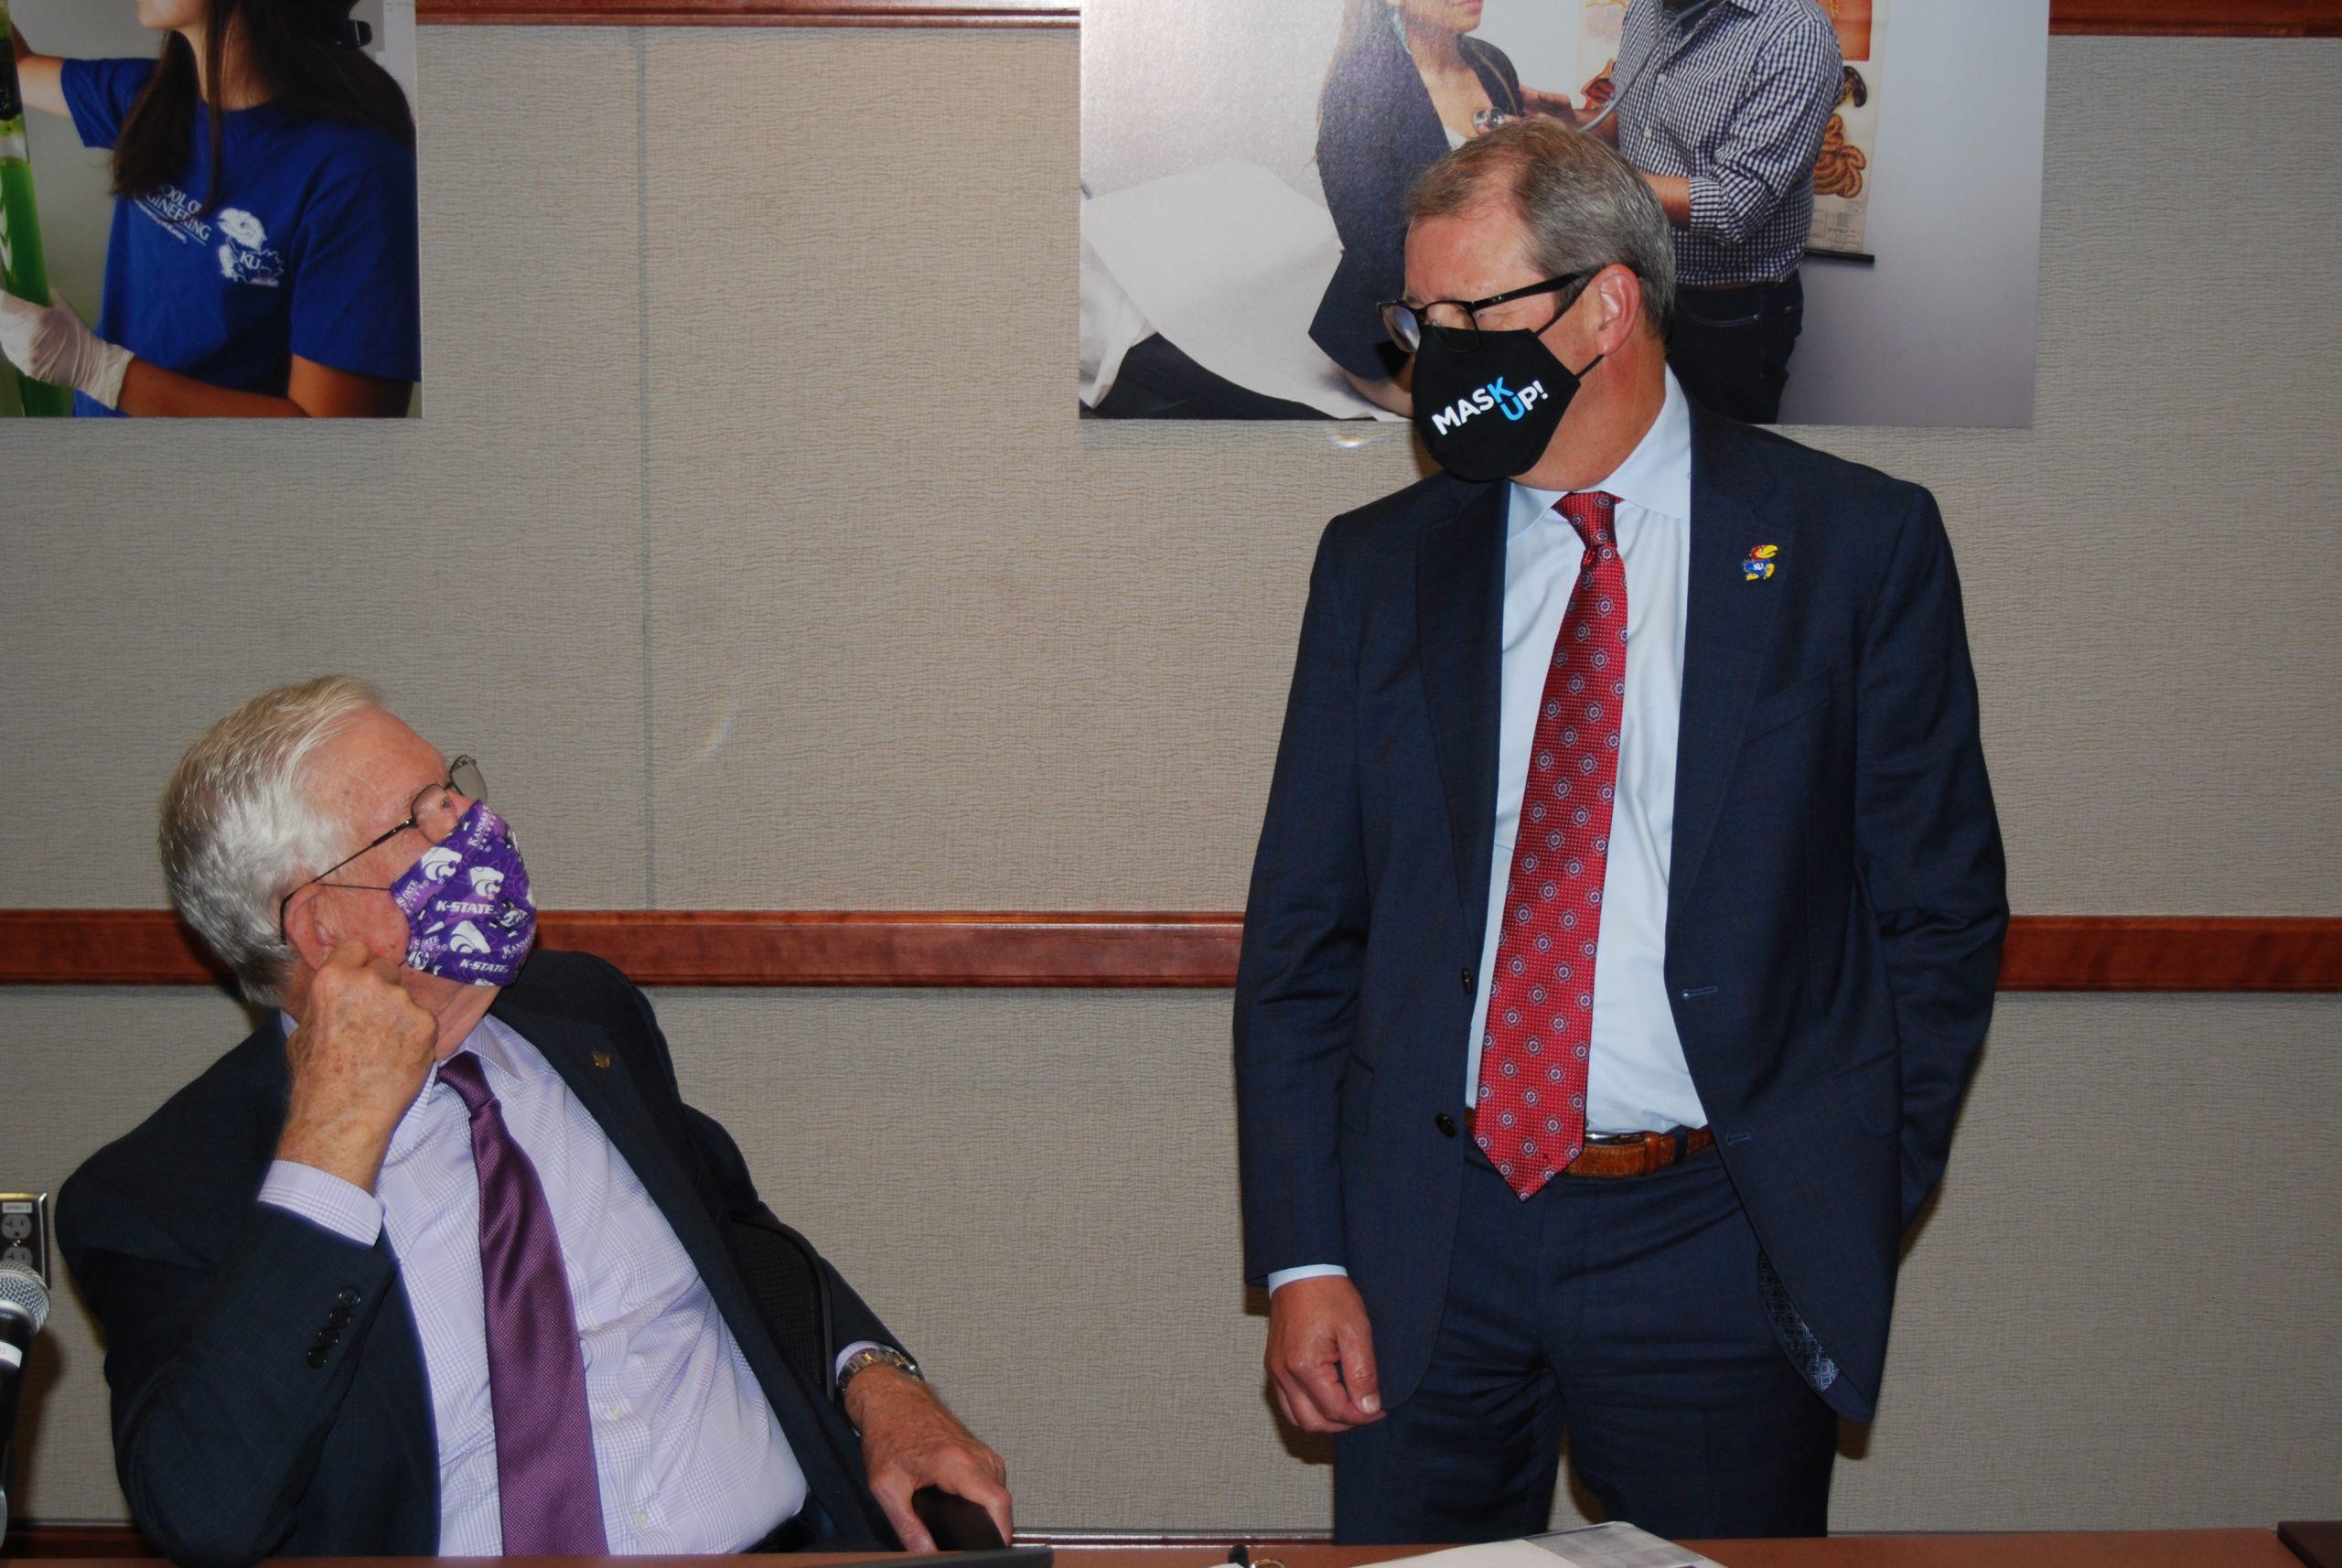 Kansas State University president Richard Myers, left, with University of Kansas chancellor Doug Girod. Myers said he would retire as KSU president at the end of 2021. (Tim Carpenter/Kansas Reflector)